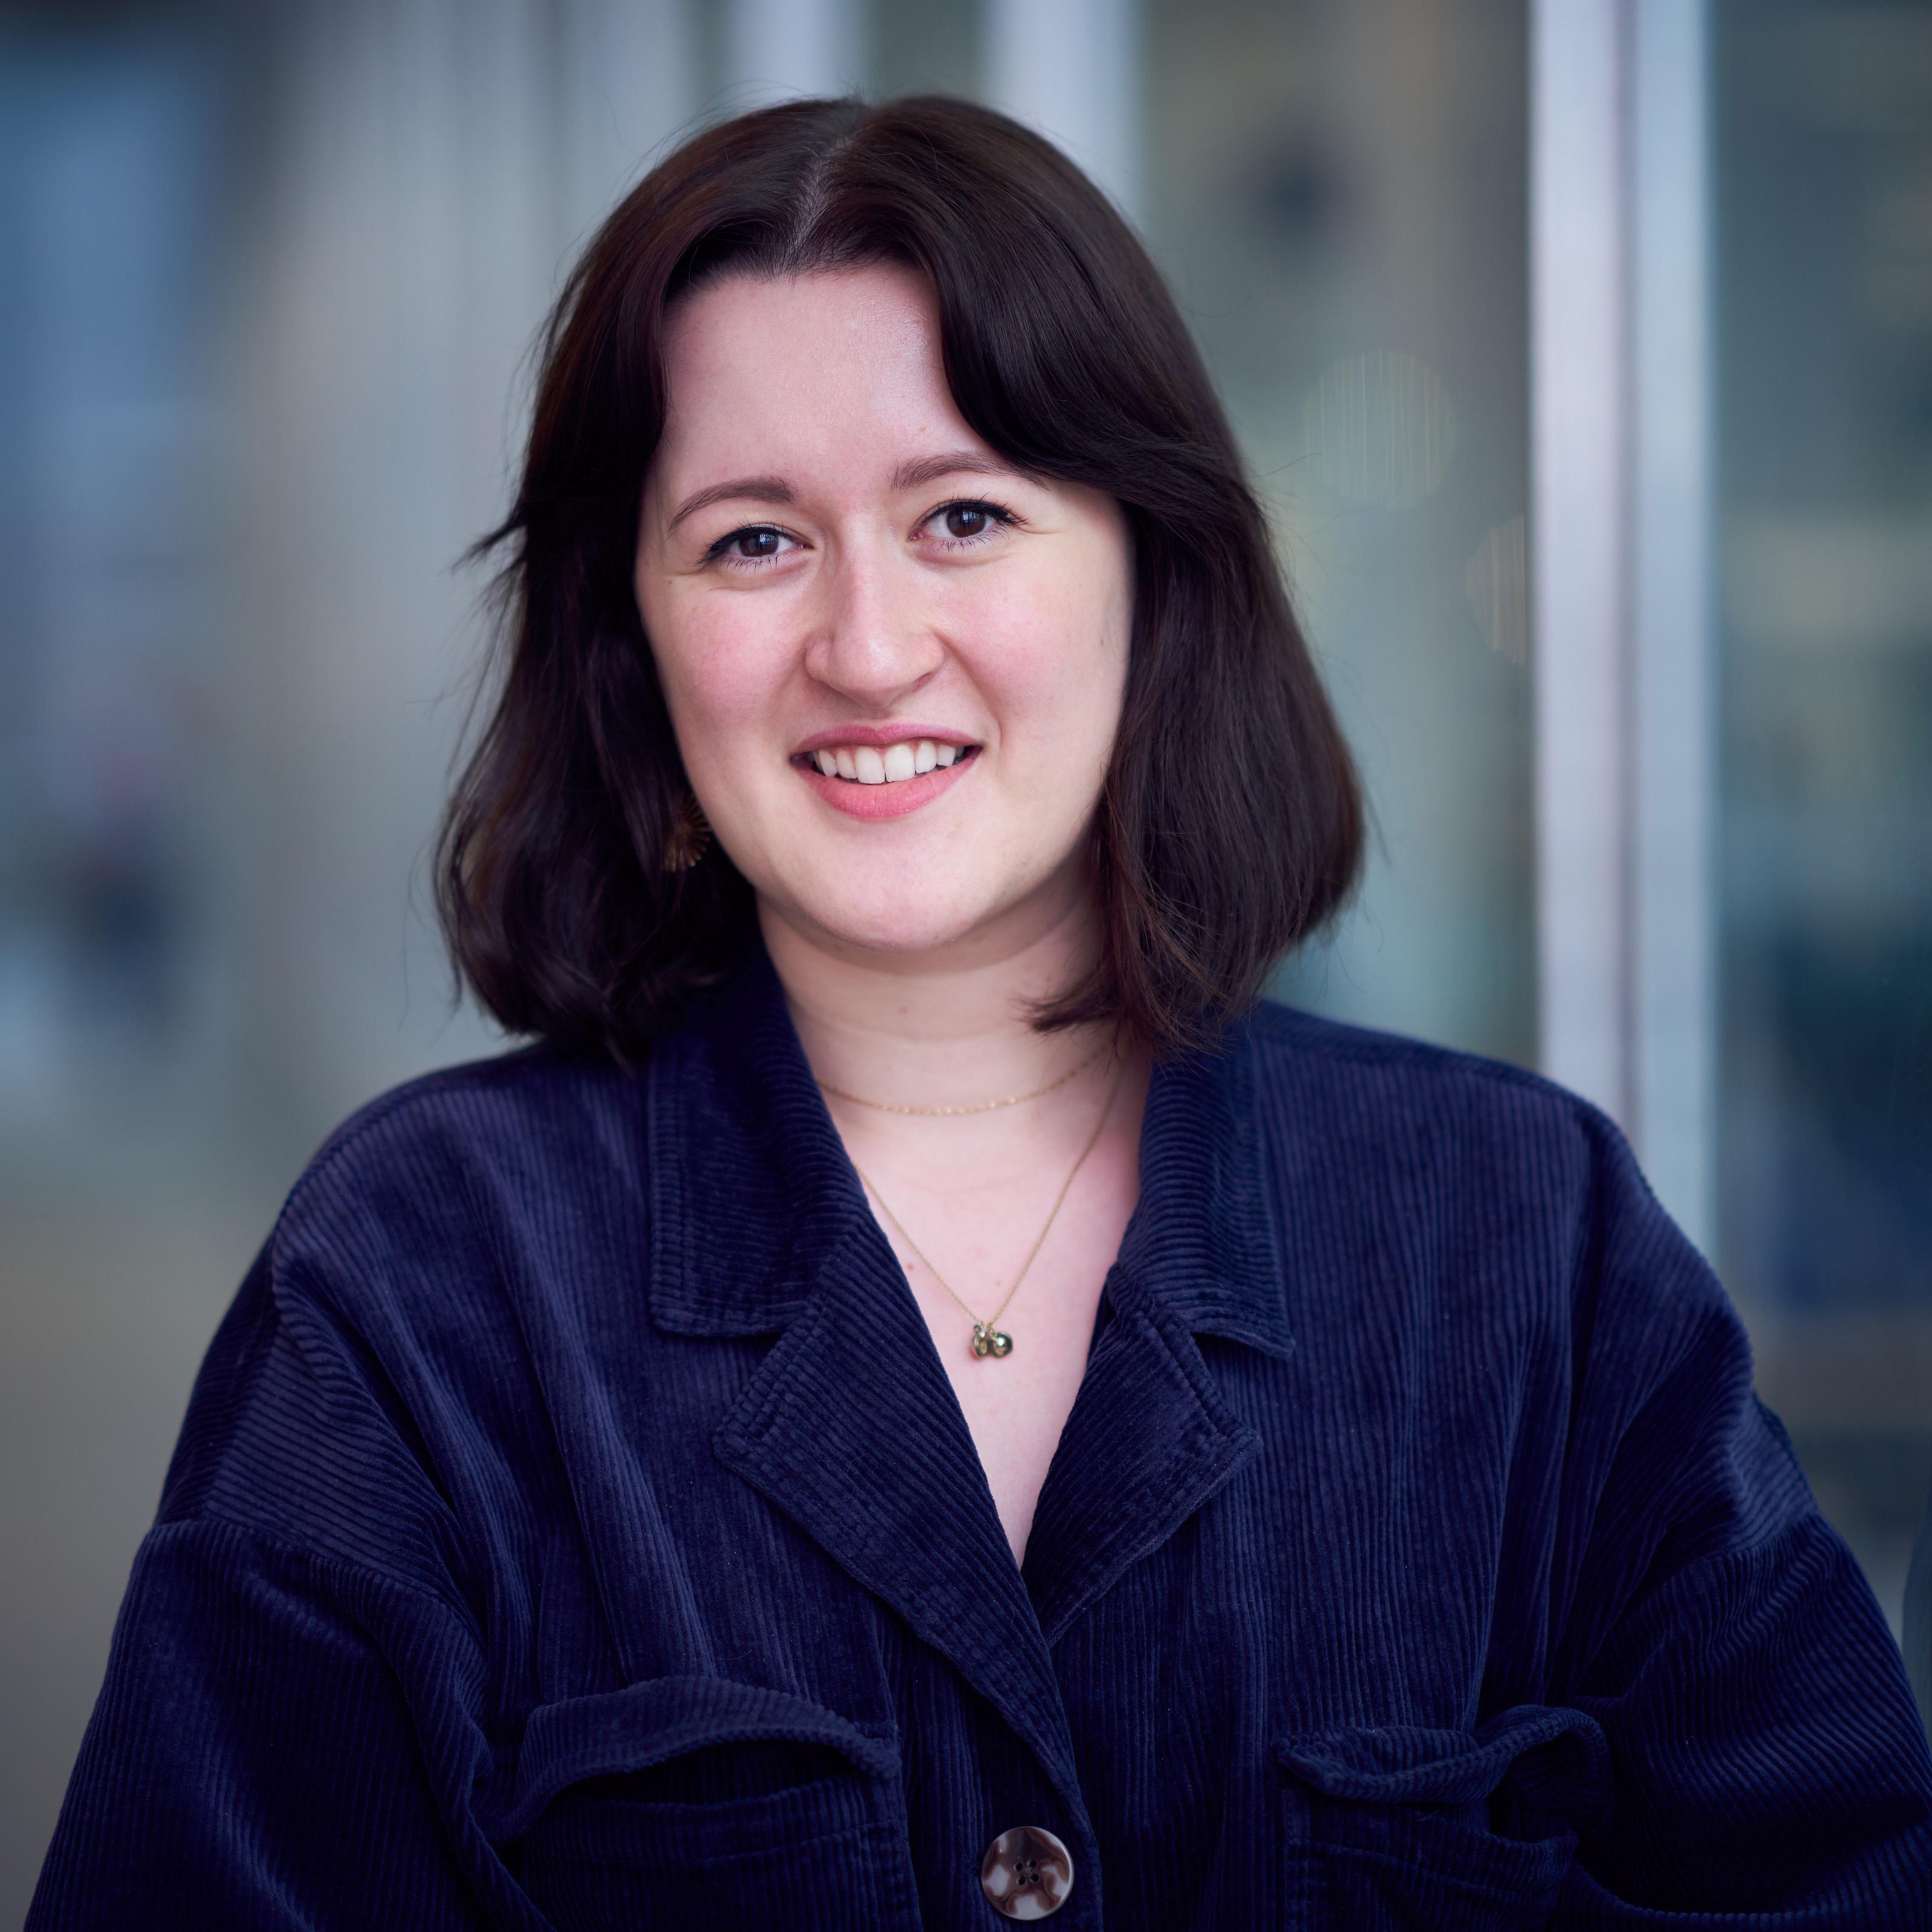 An image of Fiona Muir.